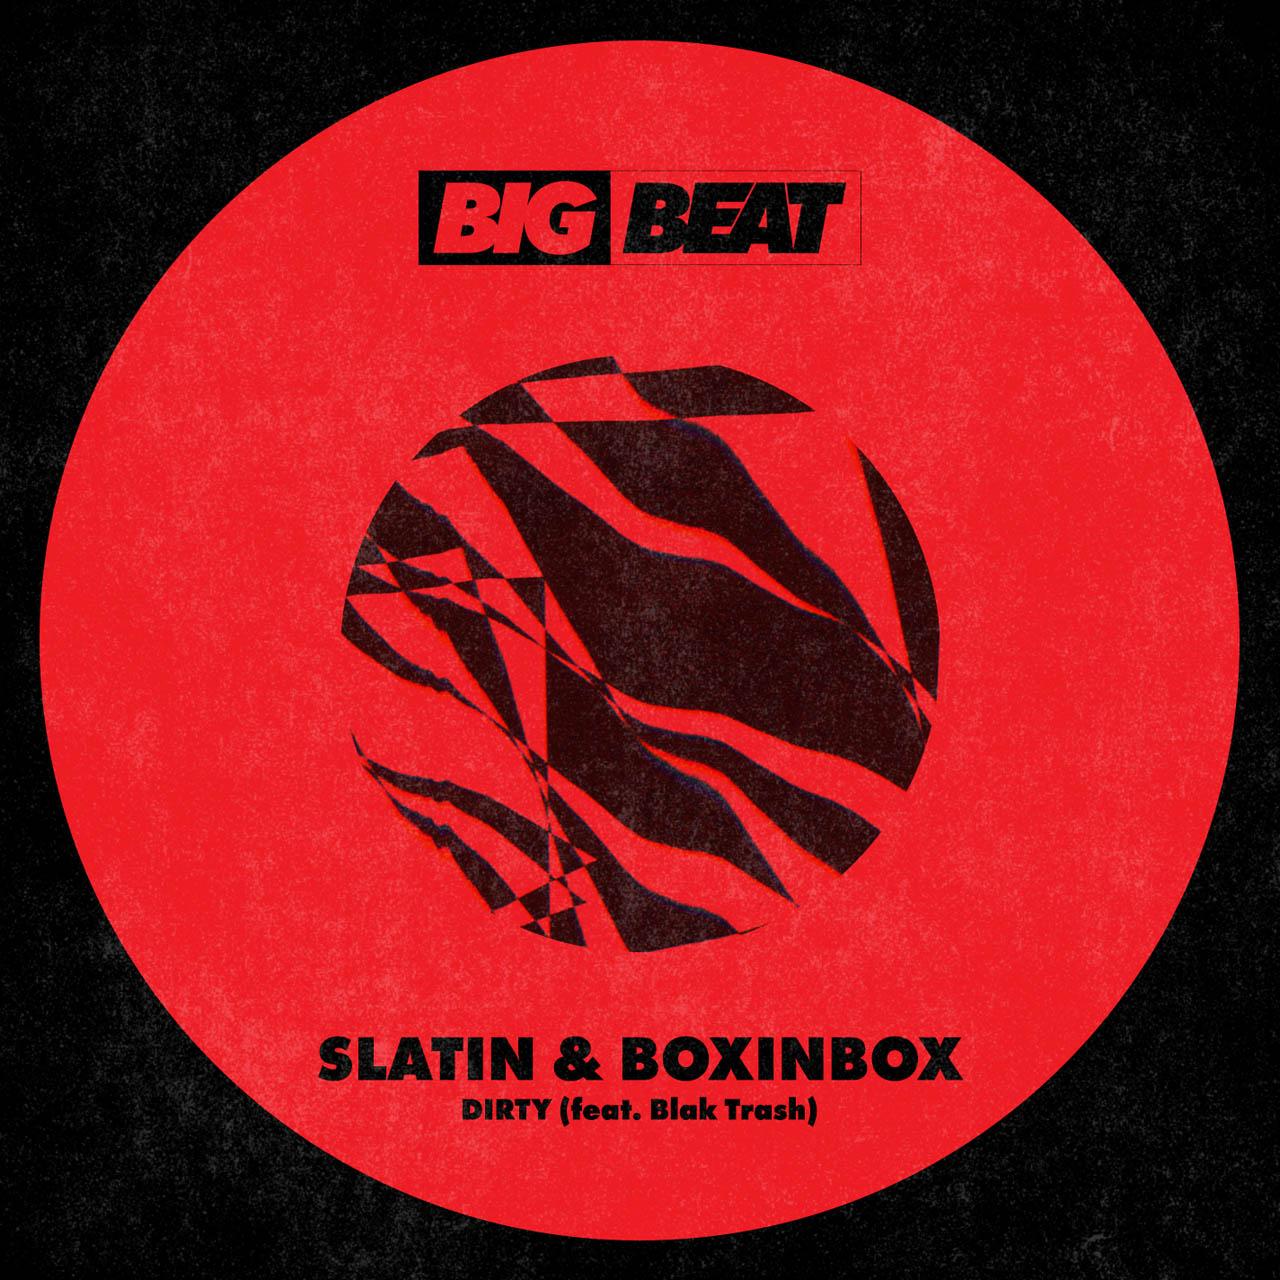 SLATIN-BOXINBOX